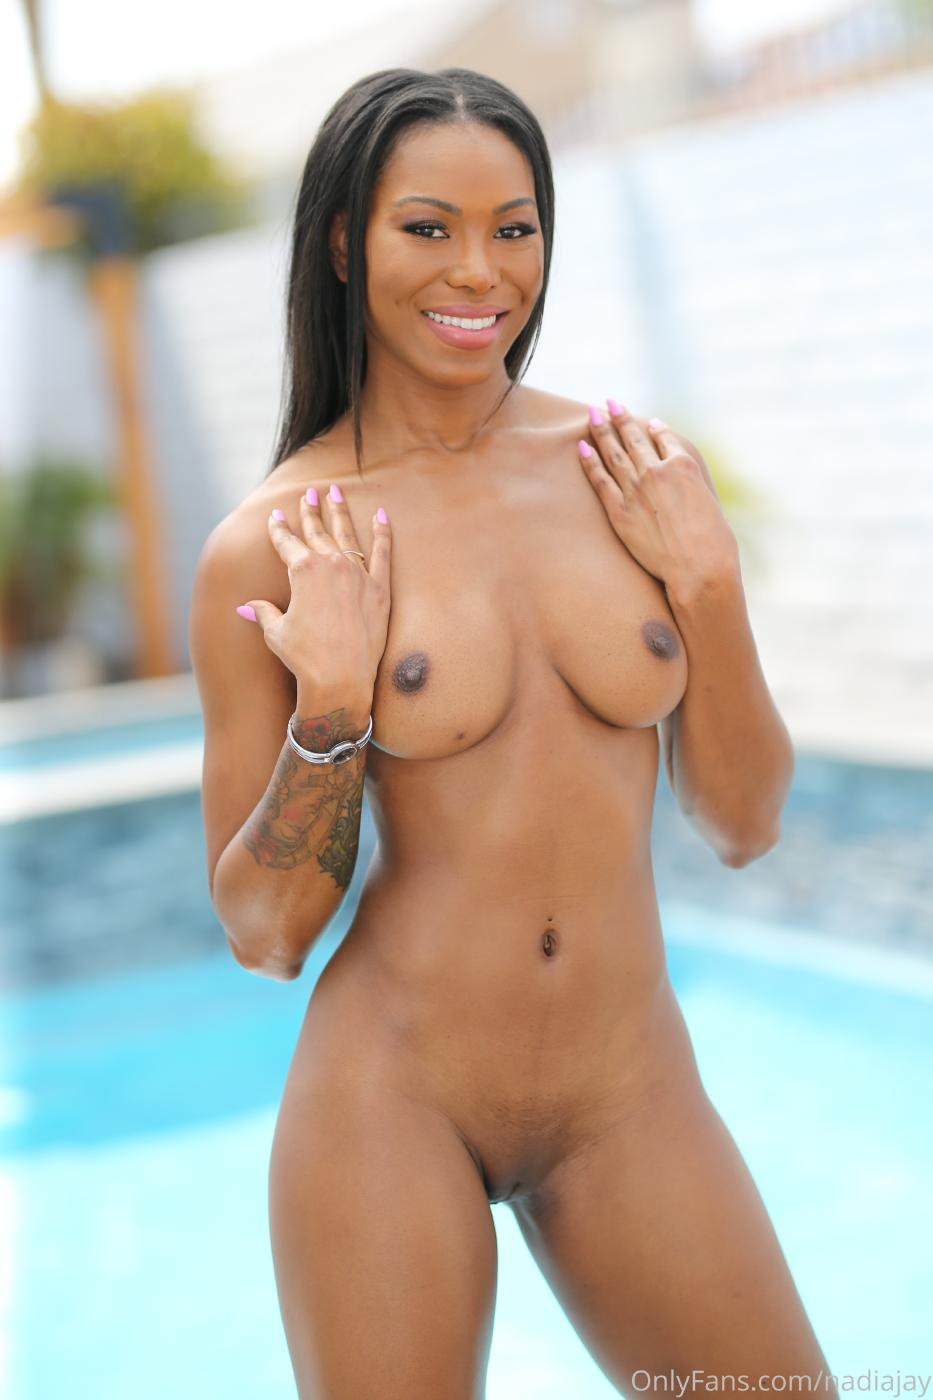 Nadia Jay Nude Lingerie Pool Strip Onlyfans Set Leaked0006